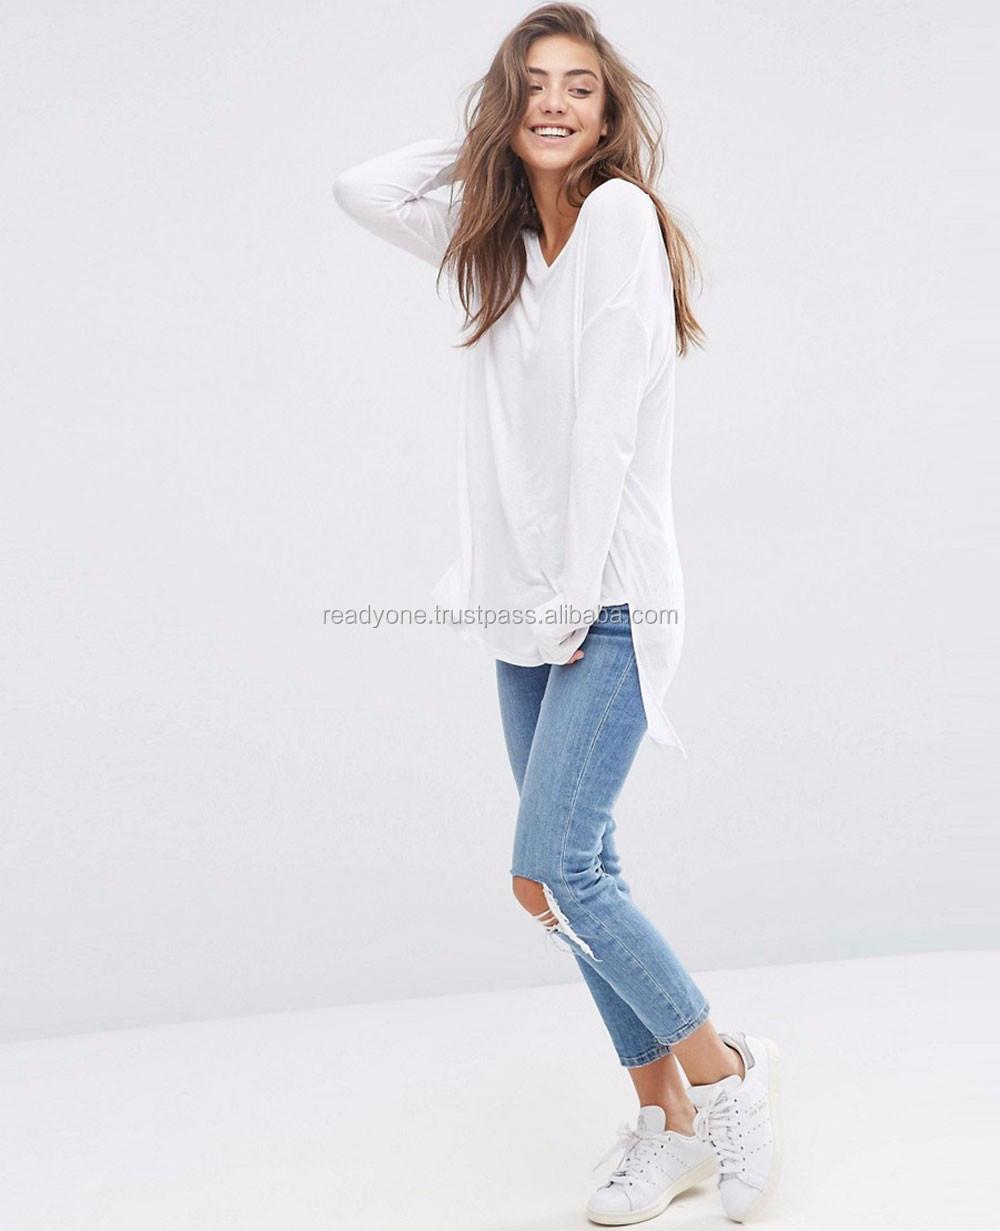 db63eca8 Supplier Custom Striped Women Longline T-shirt Wholesale - Buy ...